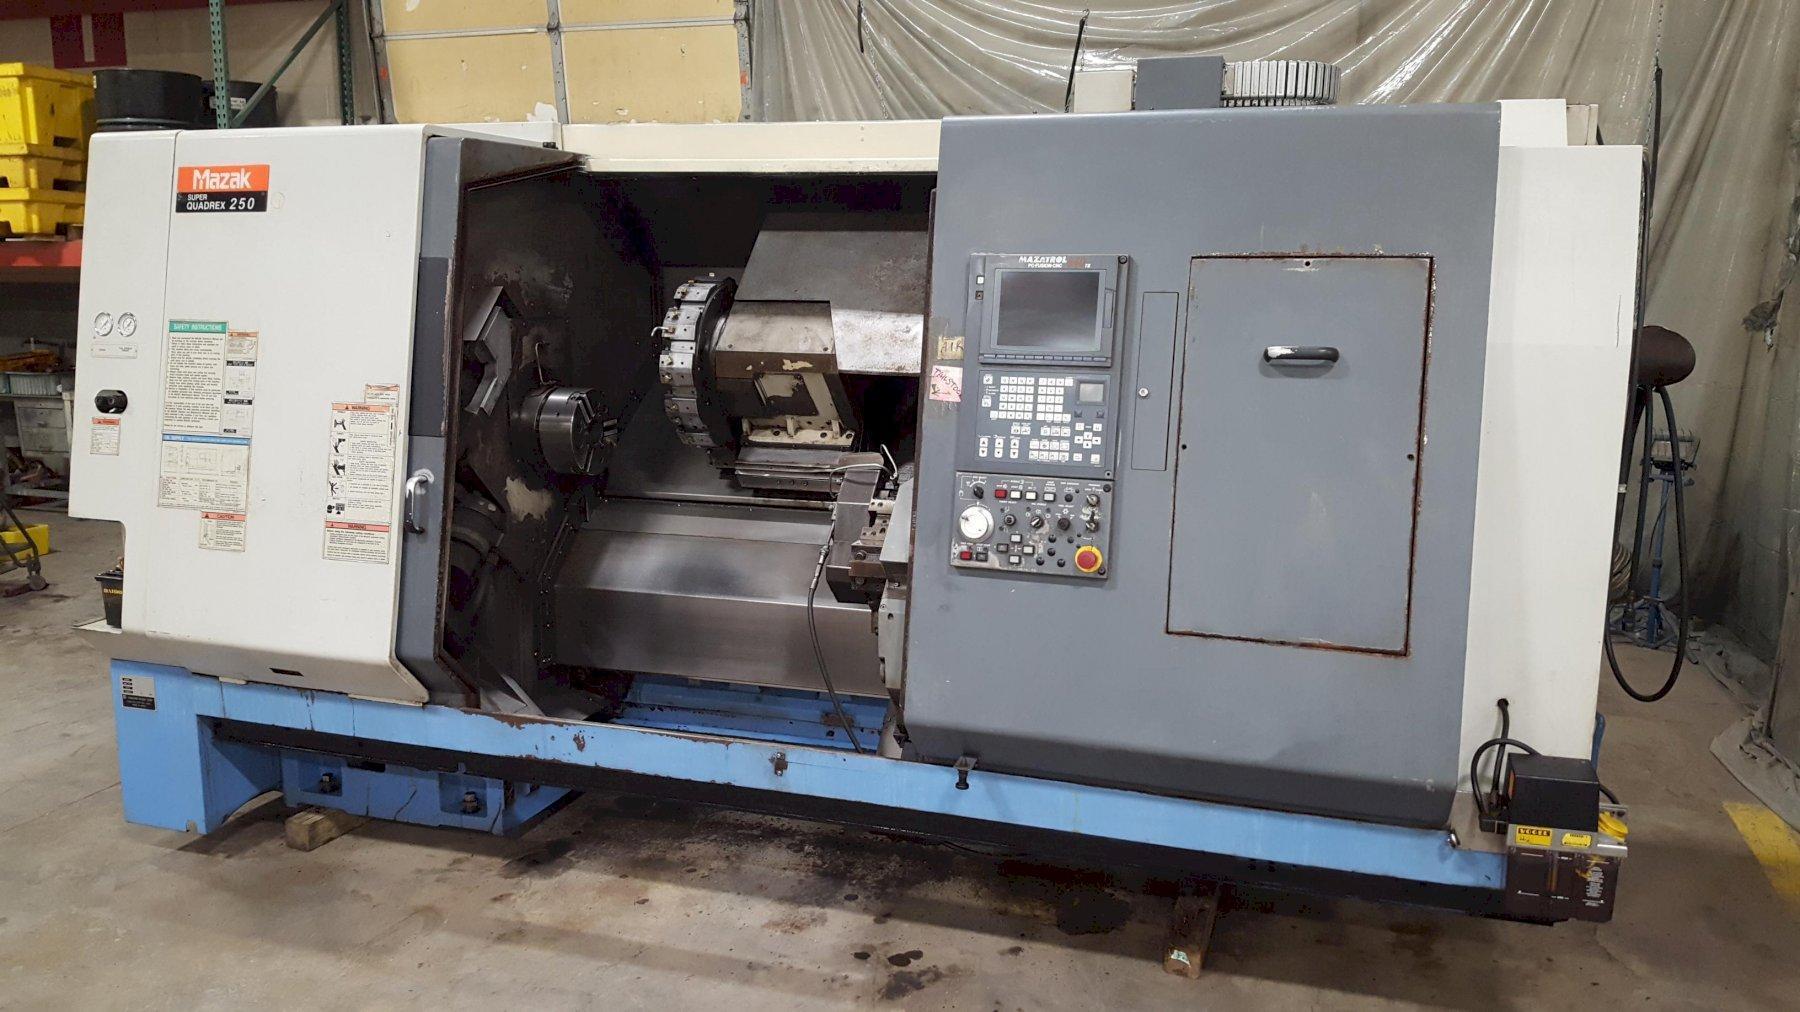 Mazak Super Quadrex 250 (SQ250) Twin Turret CNC Turning Machine